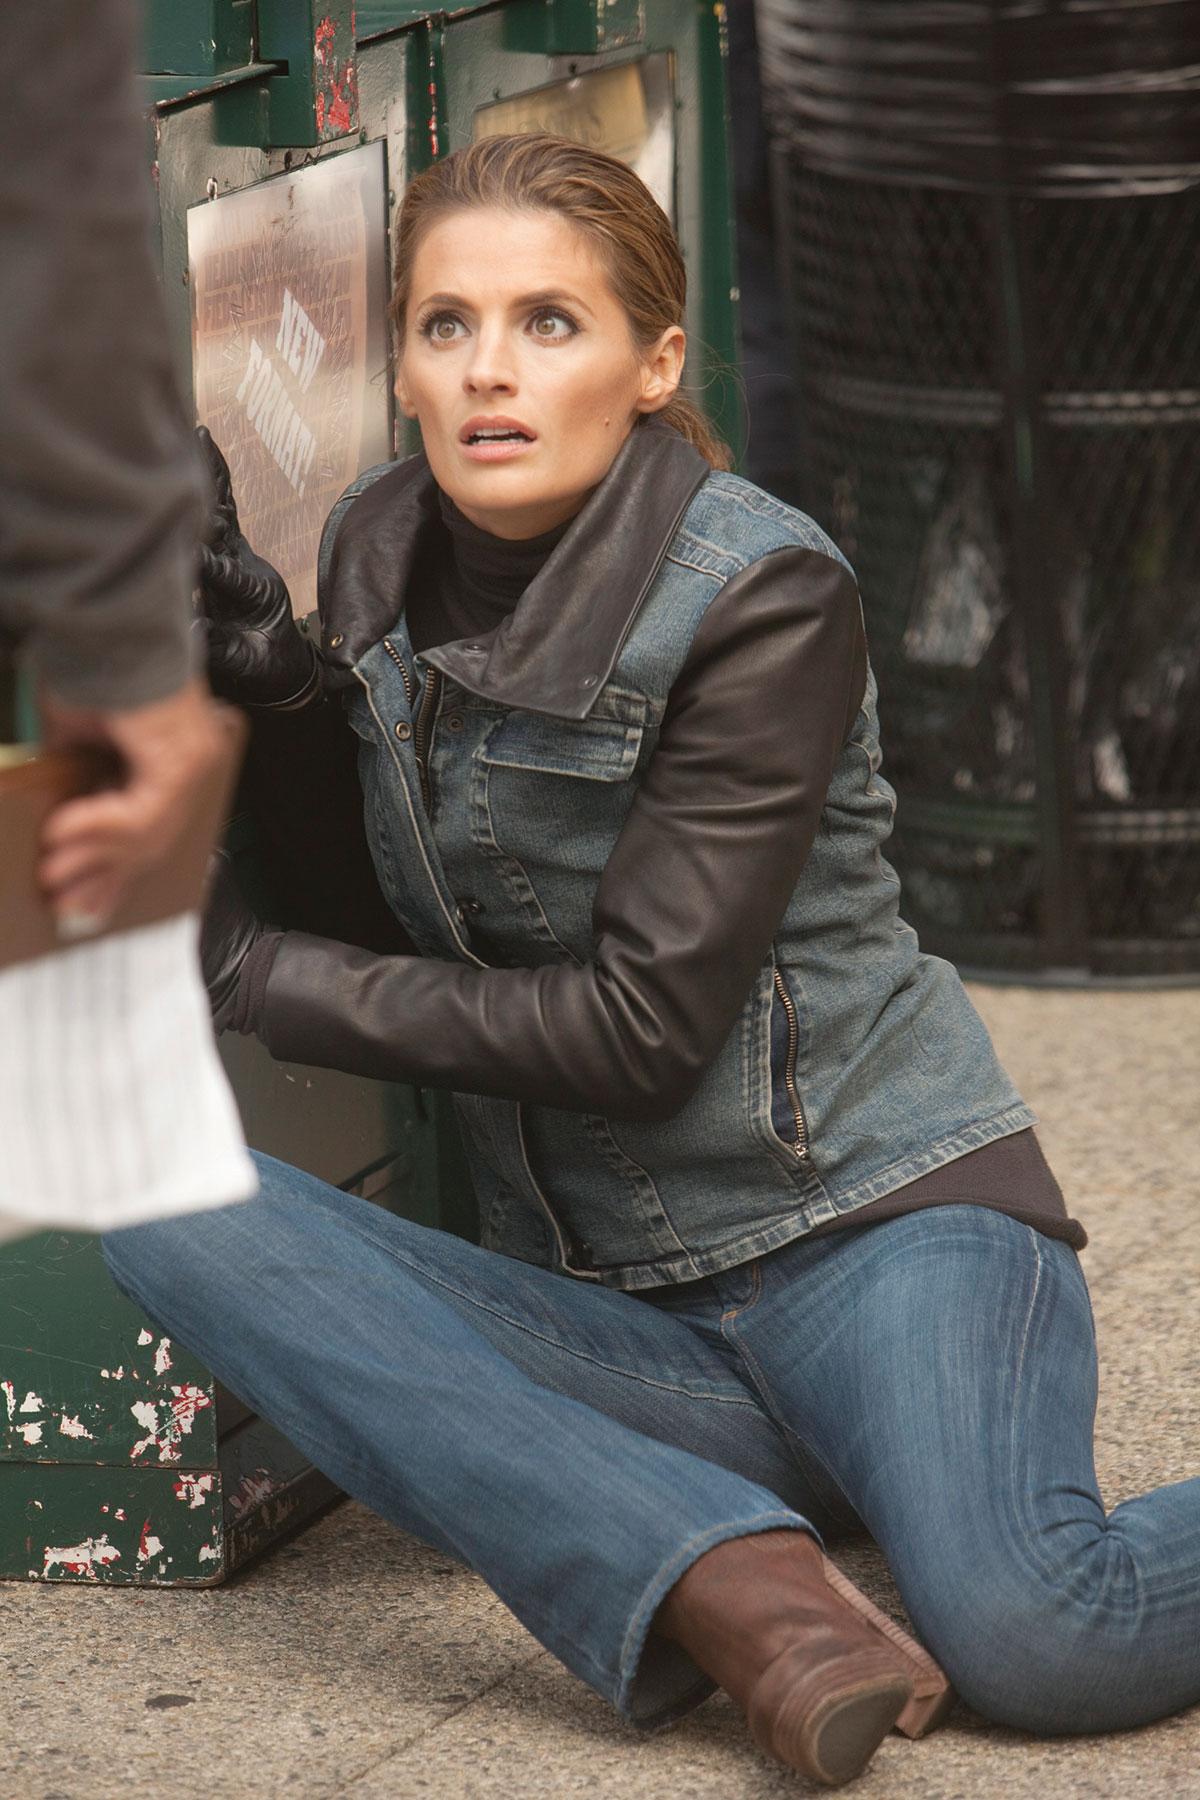 Stana-Kattic-Kate-Beckett-Castle-post-trauamatic-stress-disorder